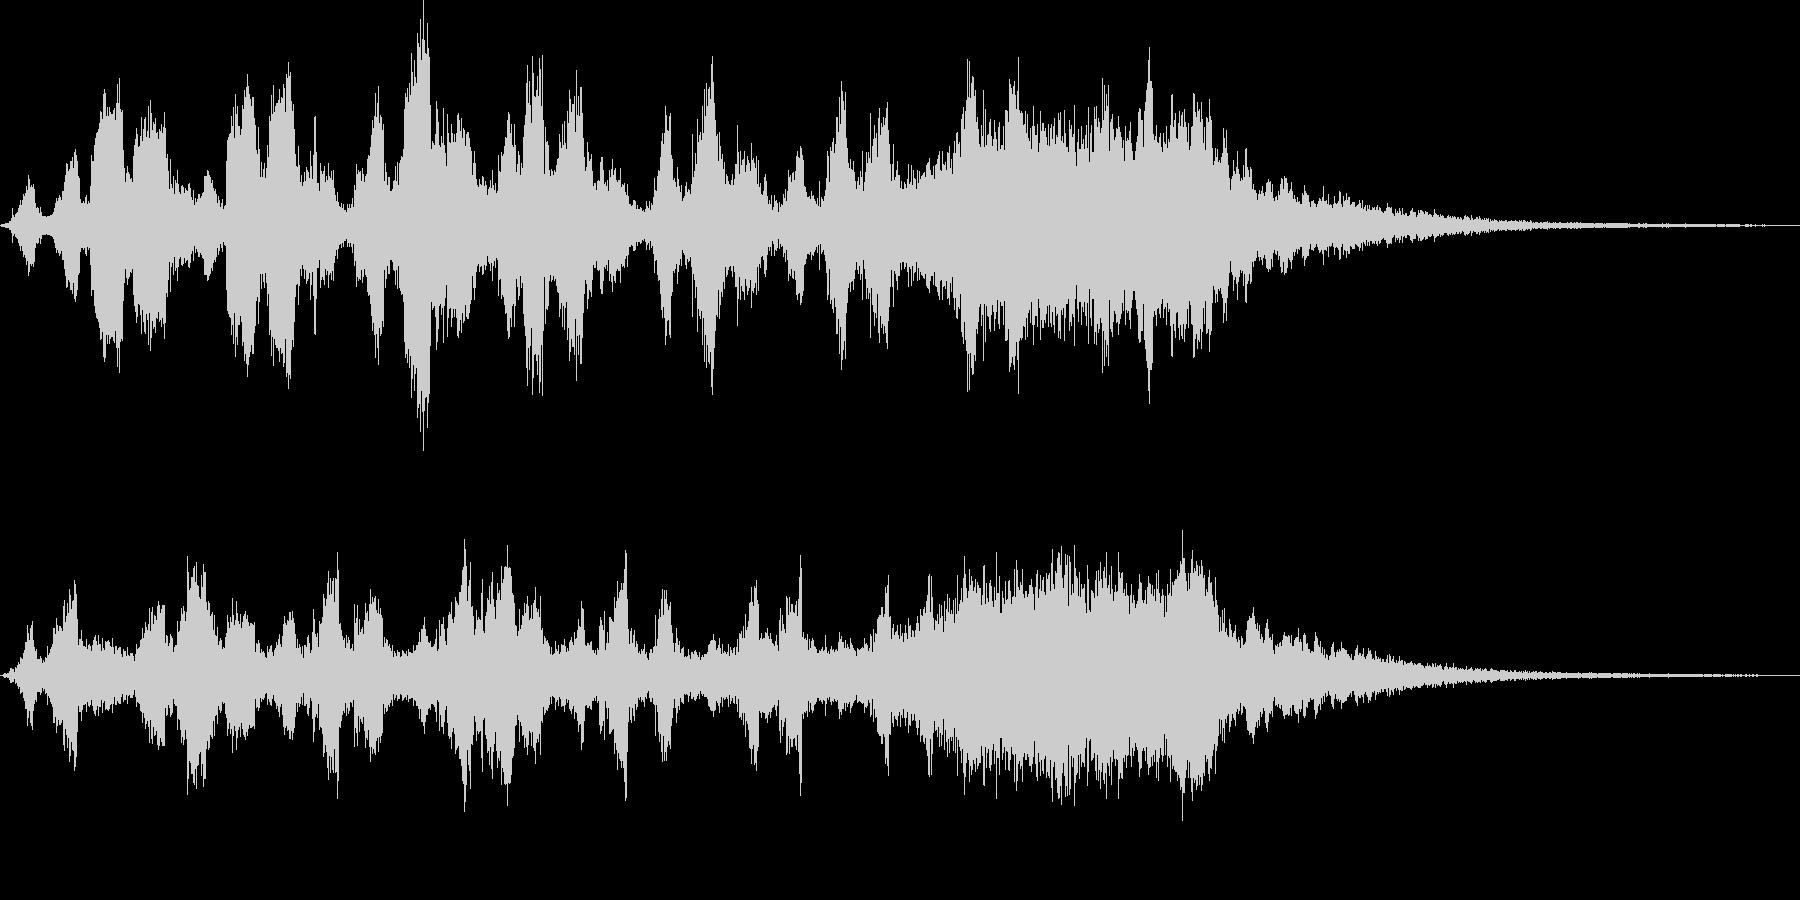 CINEMATIC RISER_09の未再生の波形